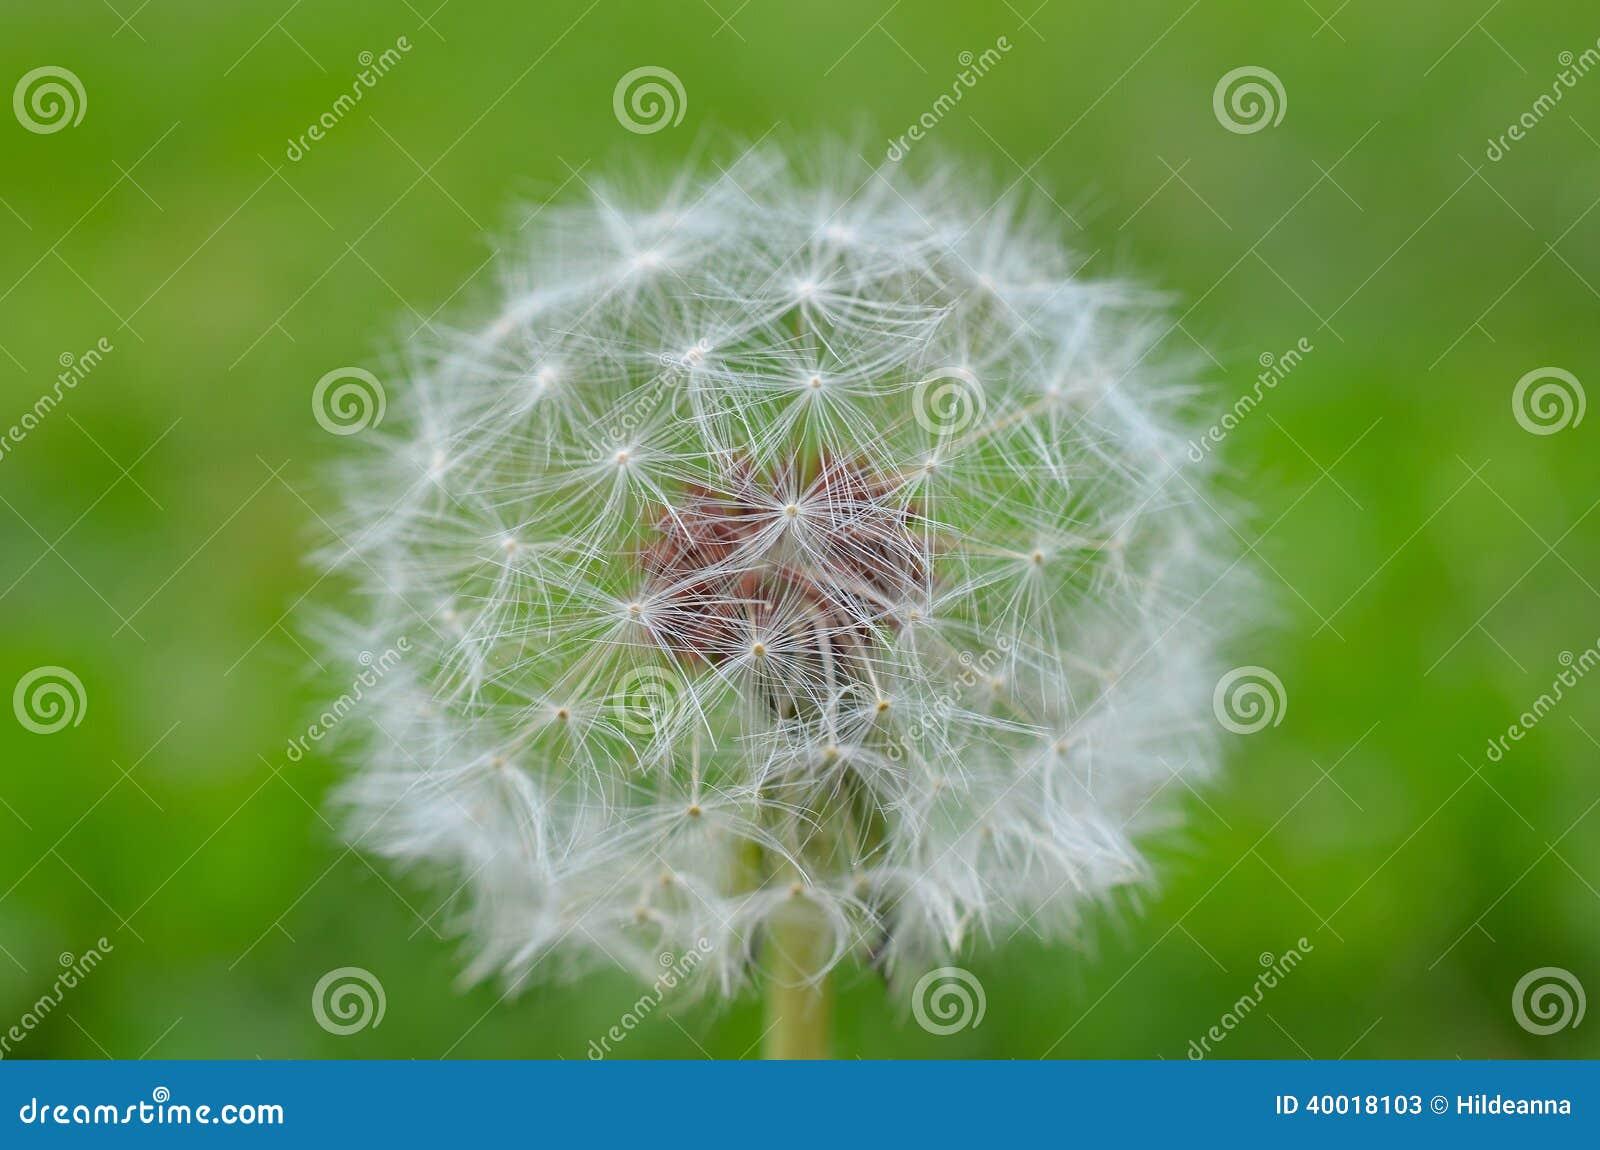 dandelion blow ball stock image image of blowball dandelion 40018103